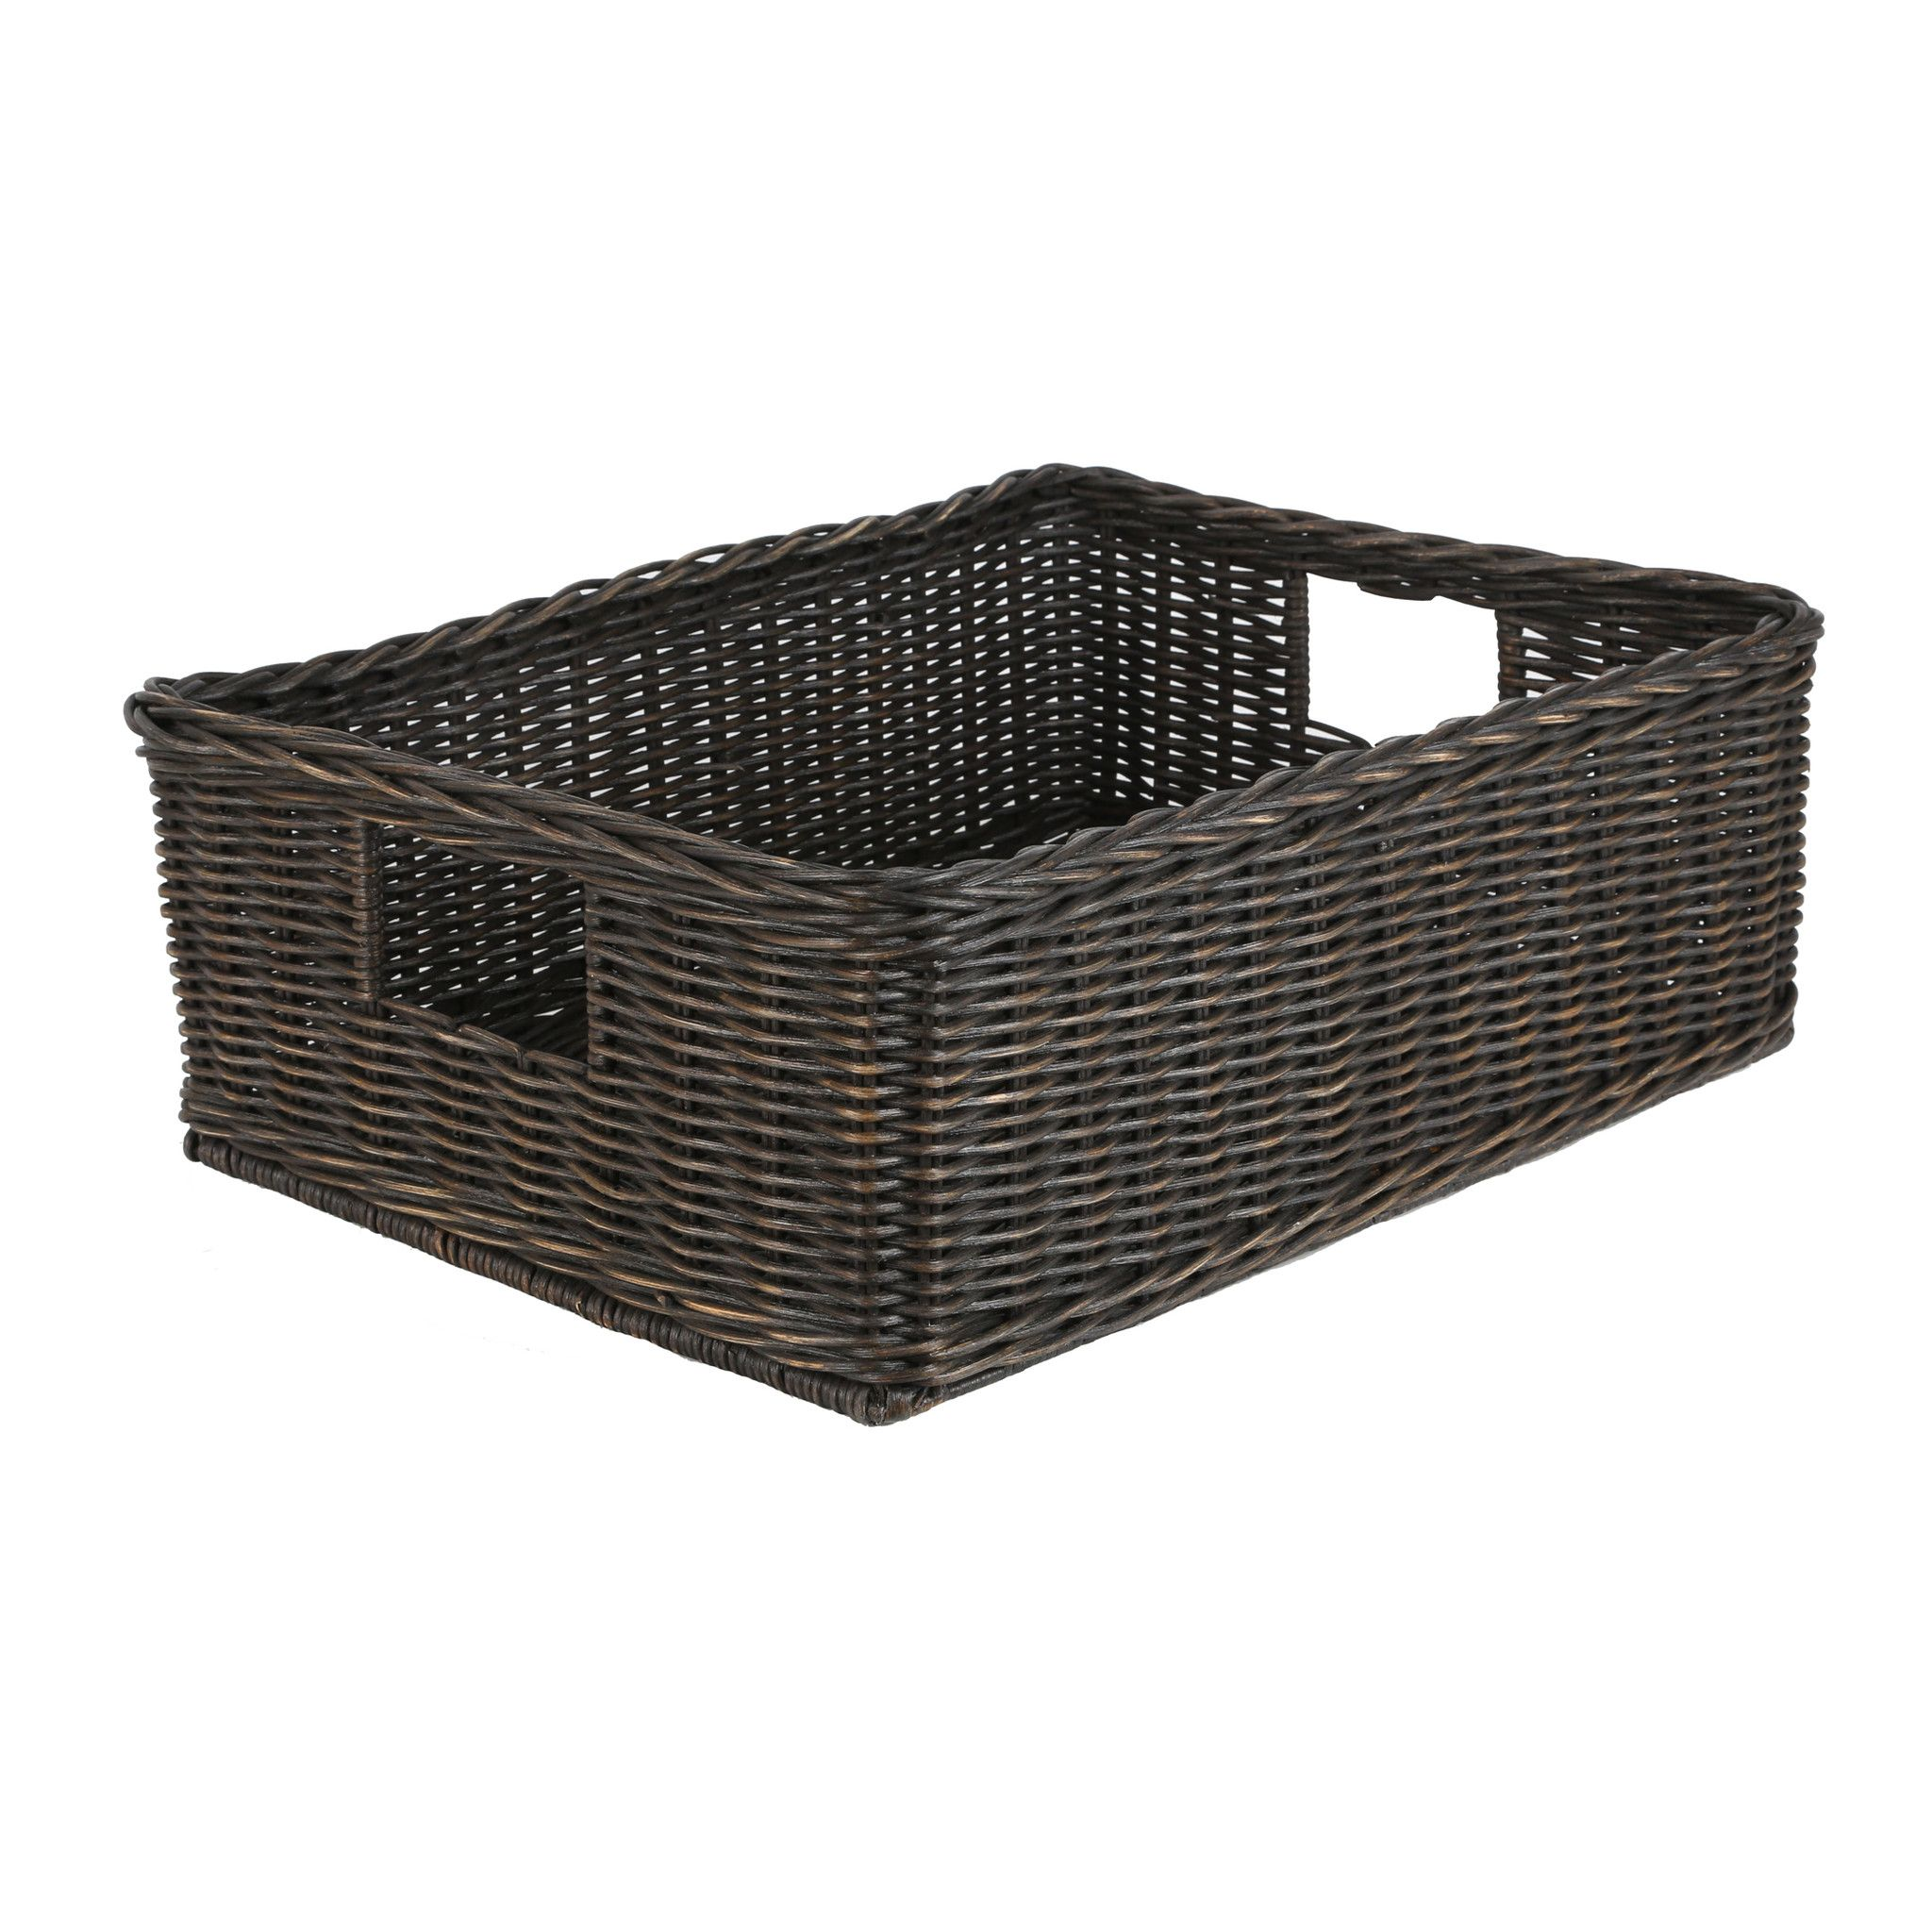 Home underbed storage baskets wicker underbed storage basket - The Basket Lady Underbed Wicker Storage Basket In Antique Walnut Brown Size L From The Basket